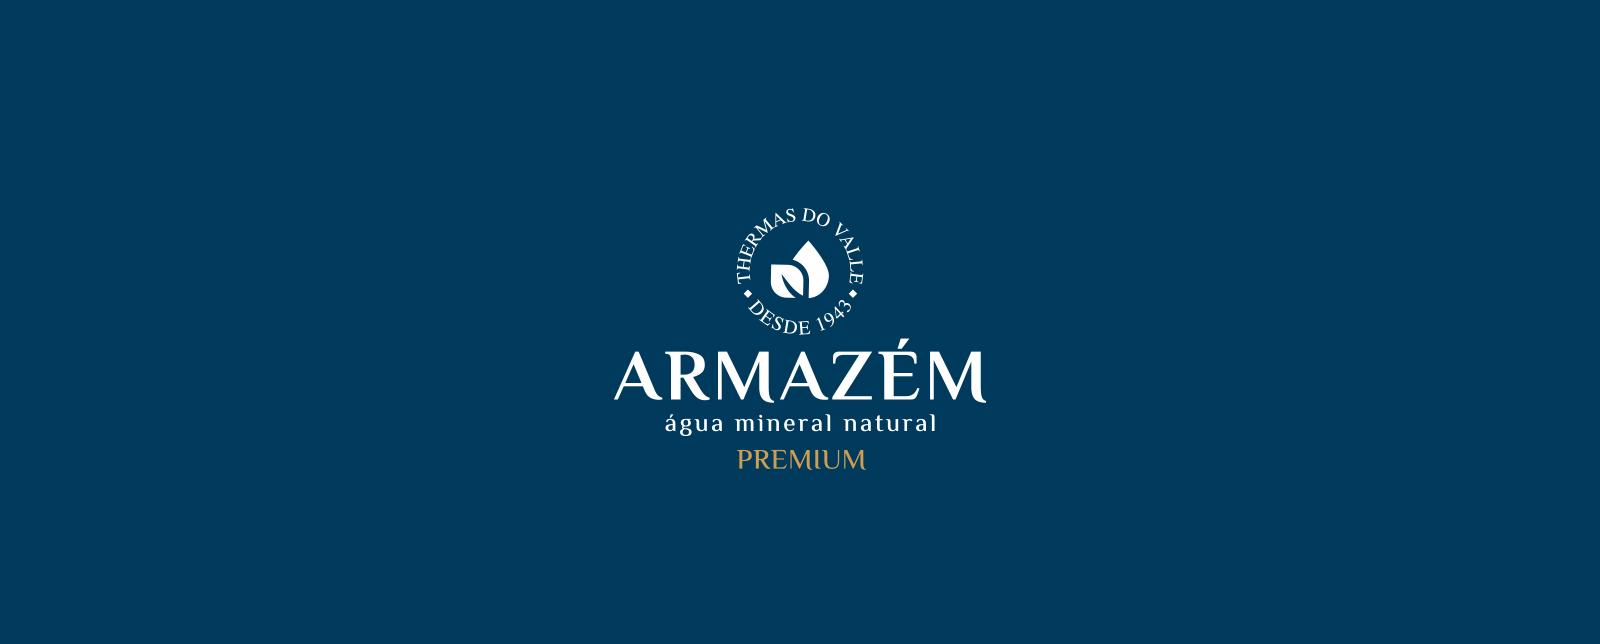 Design de rótulo e branding para água mineral premium